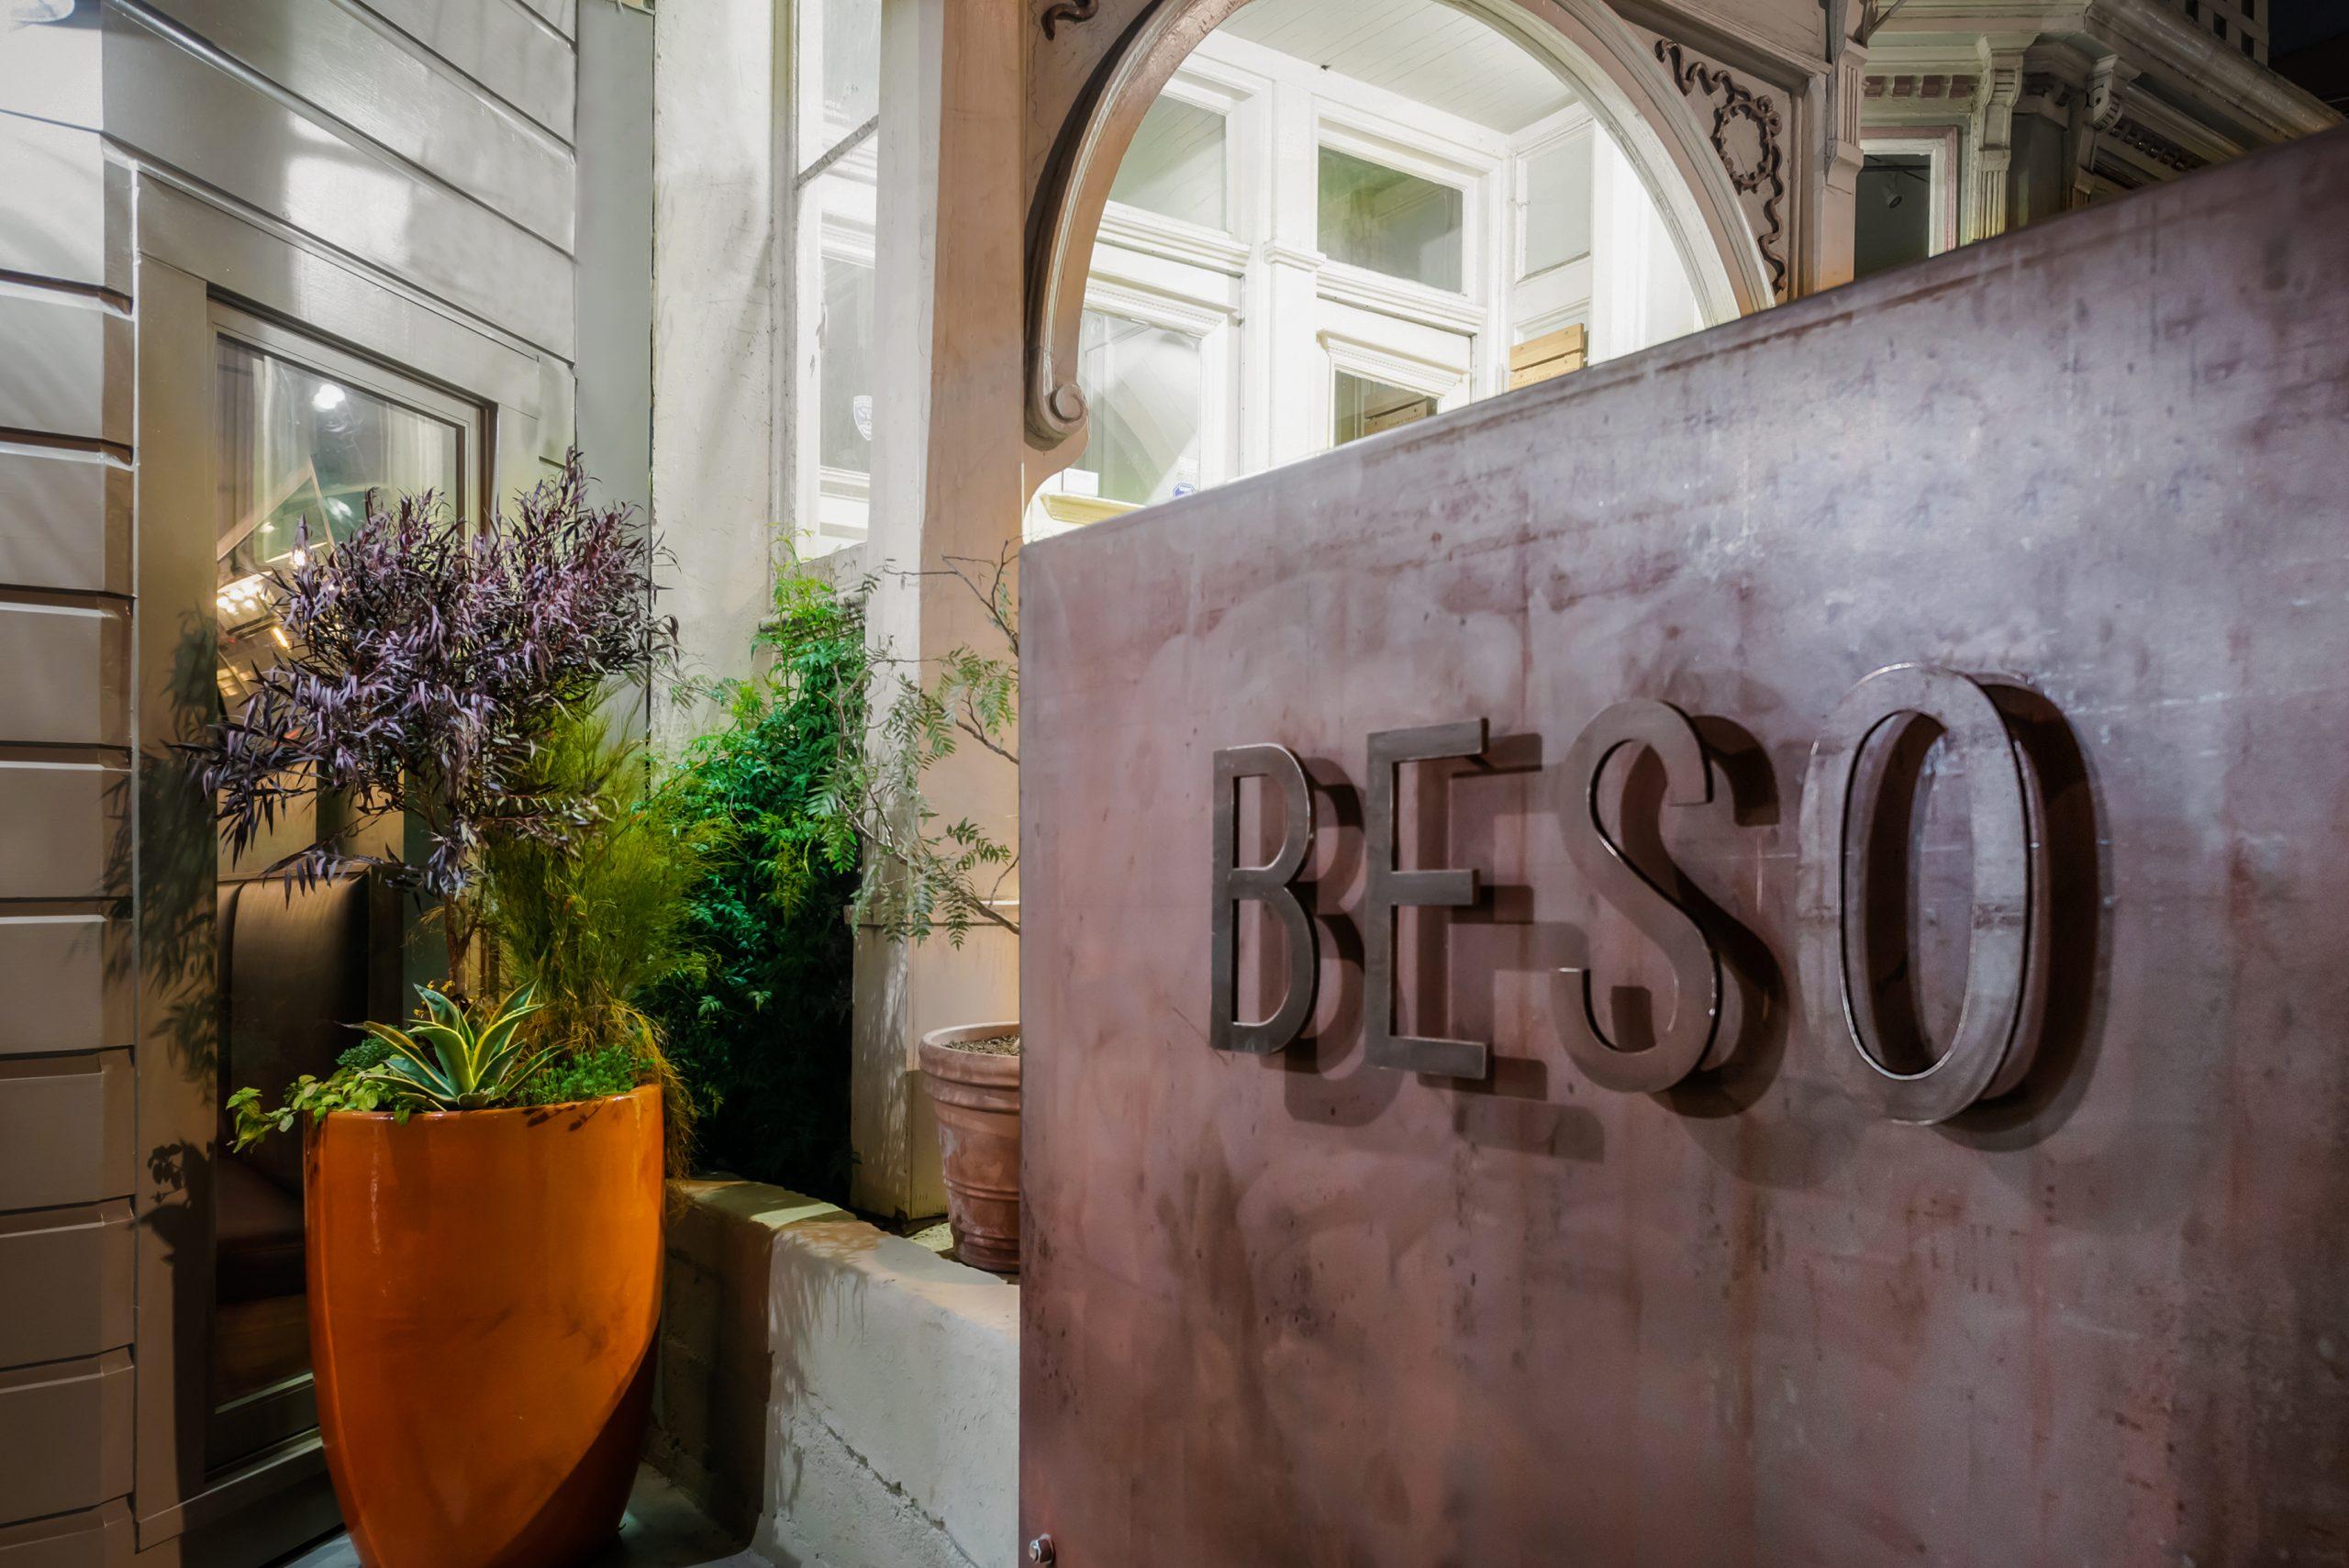 Beso-4058-19th-Street-San-Francisco-CA-Photo-1